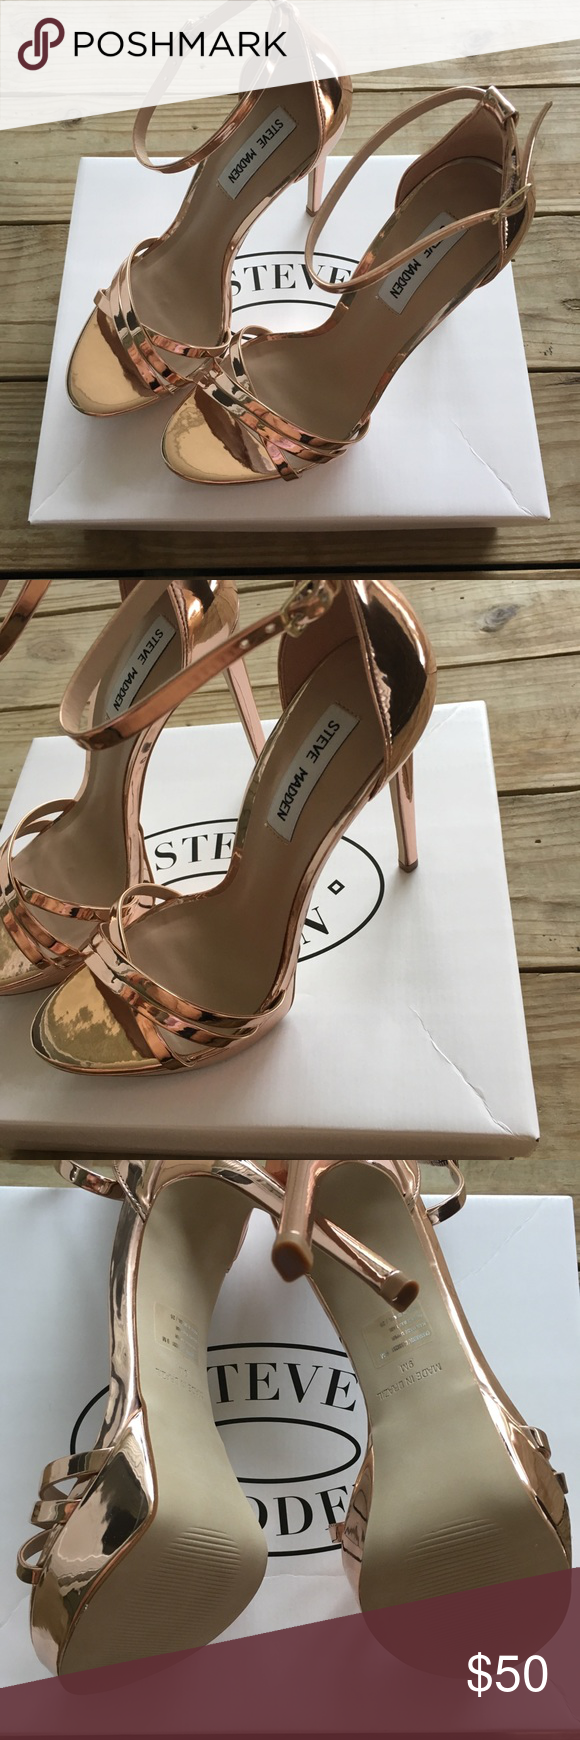 3a4a5121c3d7 Steve Madden Heels Steve Madden Cassandra Ankle strap sandal Rose Gold Size  9 New in box Steve Madden Shoes Heels